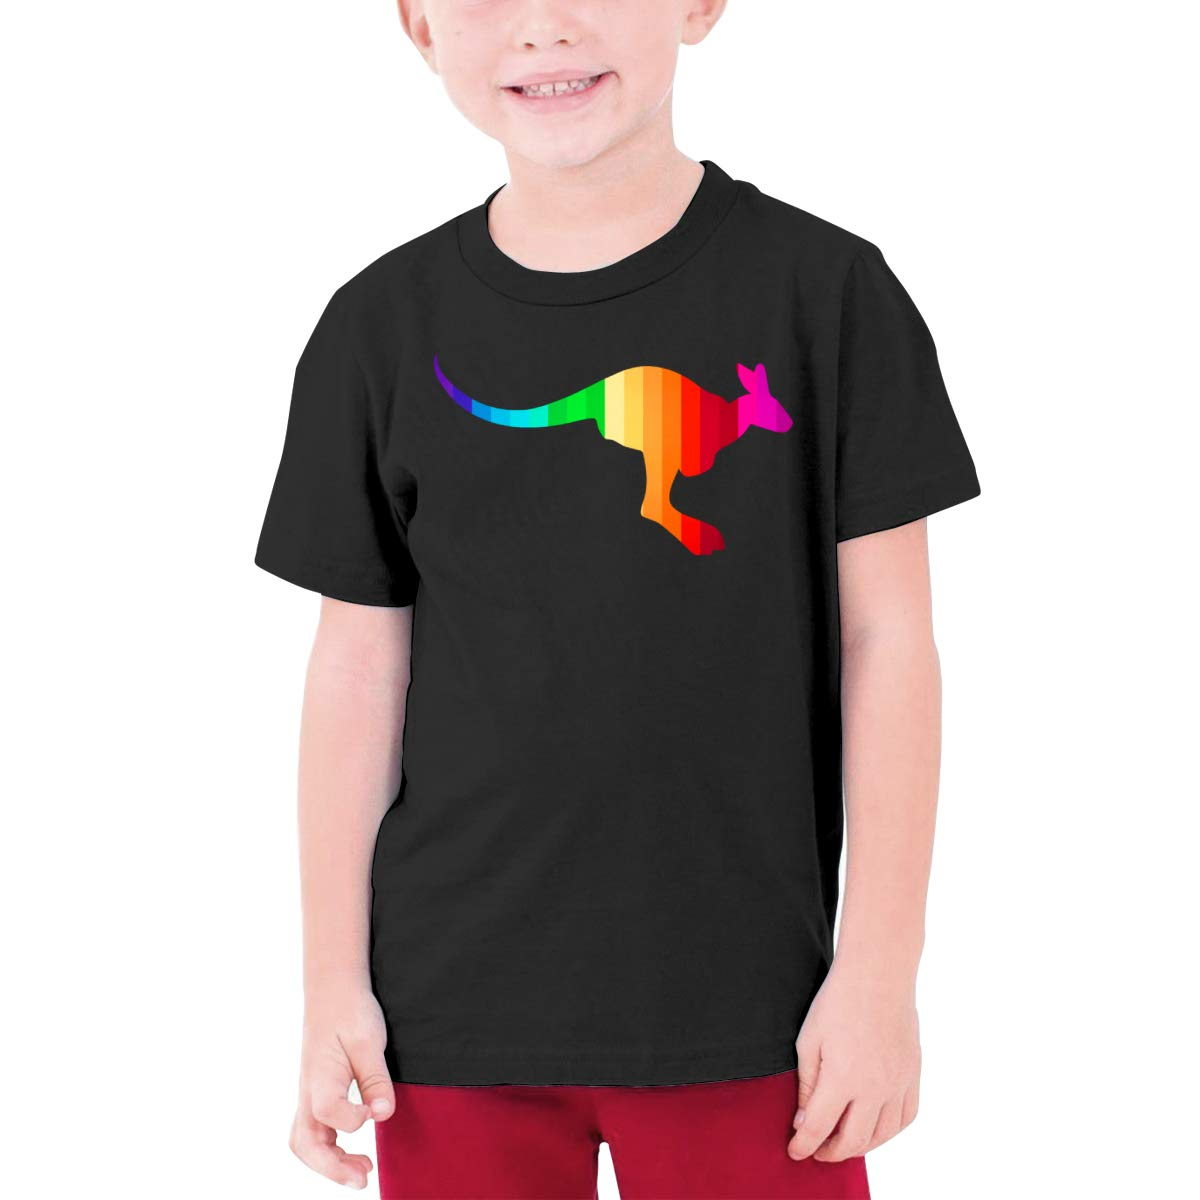 Cute Kangaroo Rainbow Colors Boys Short-Sleeve Shirts